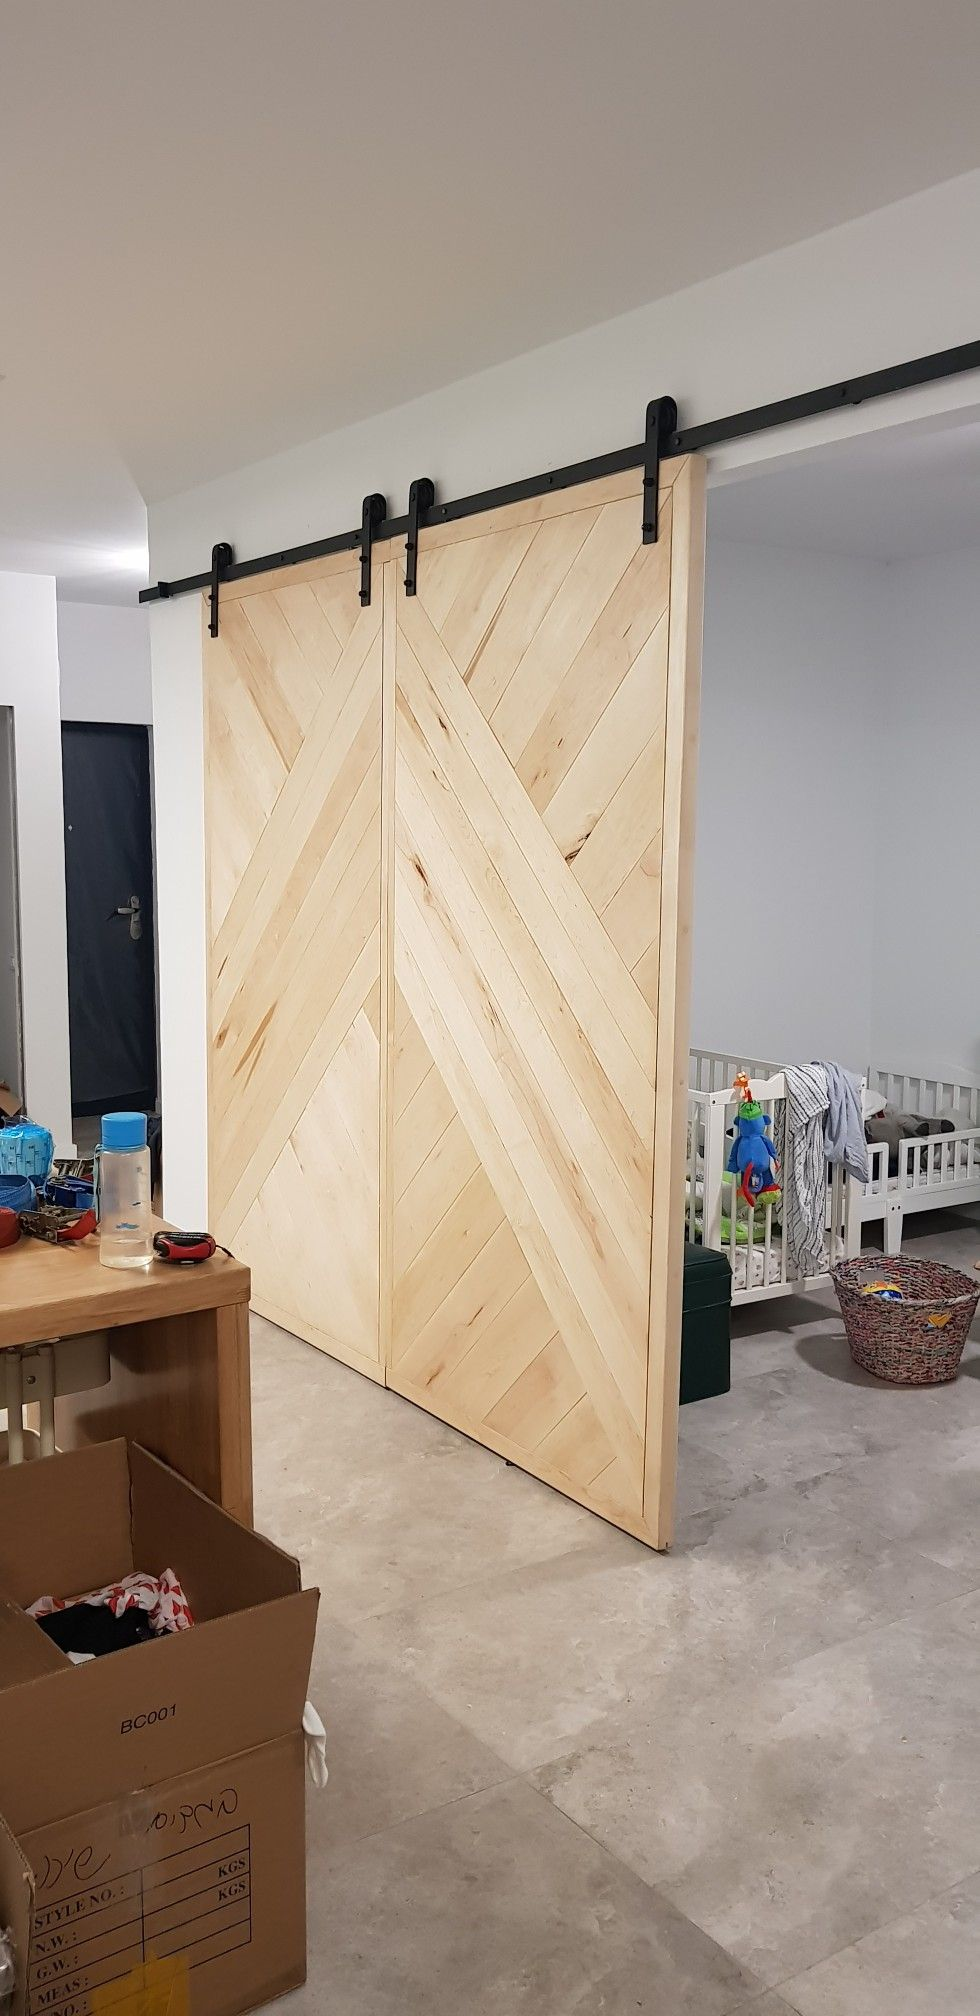 Hard Maple Sliding Barn Door Avivremodeling Wood Workin Pros Www Work Org Il